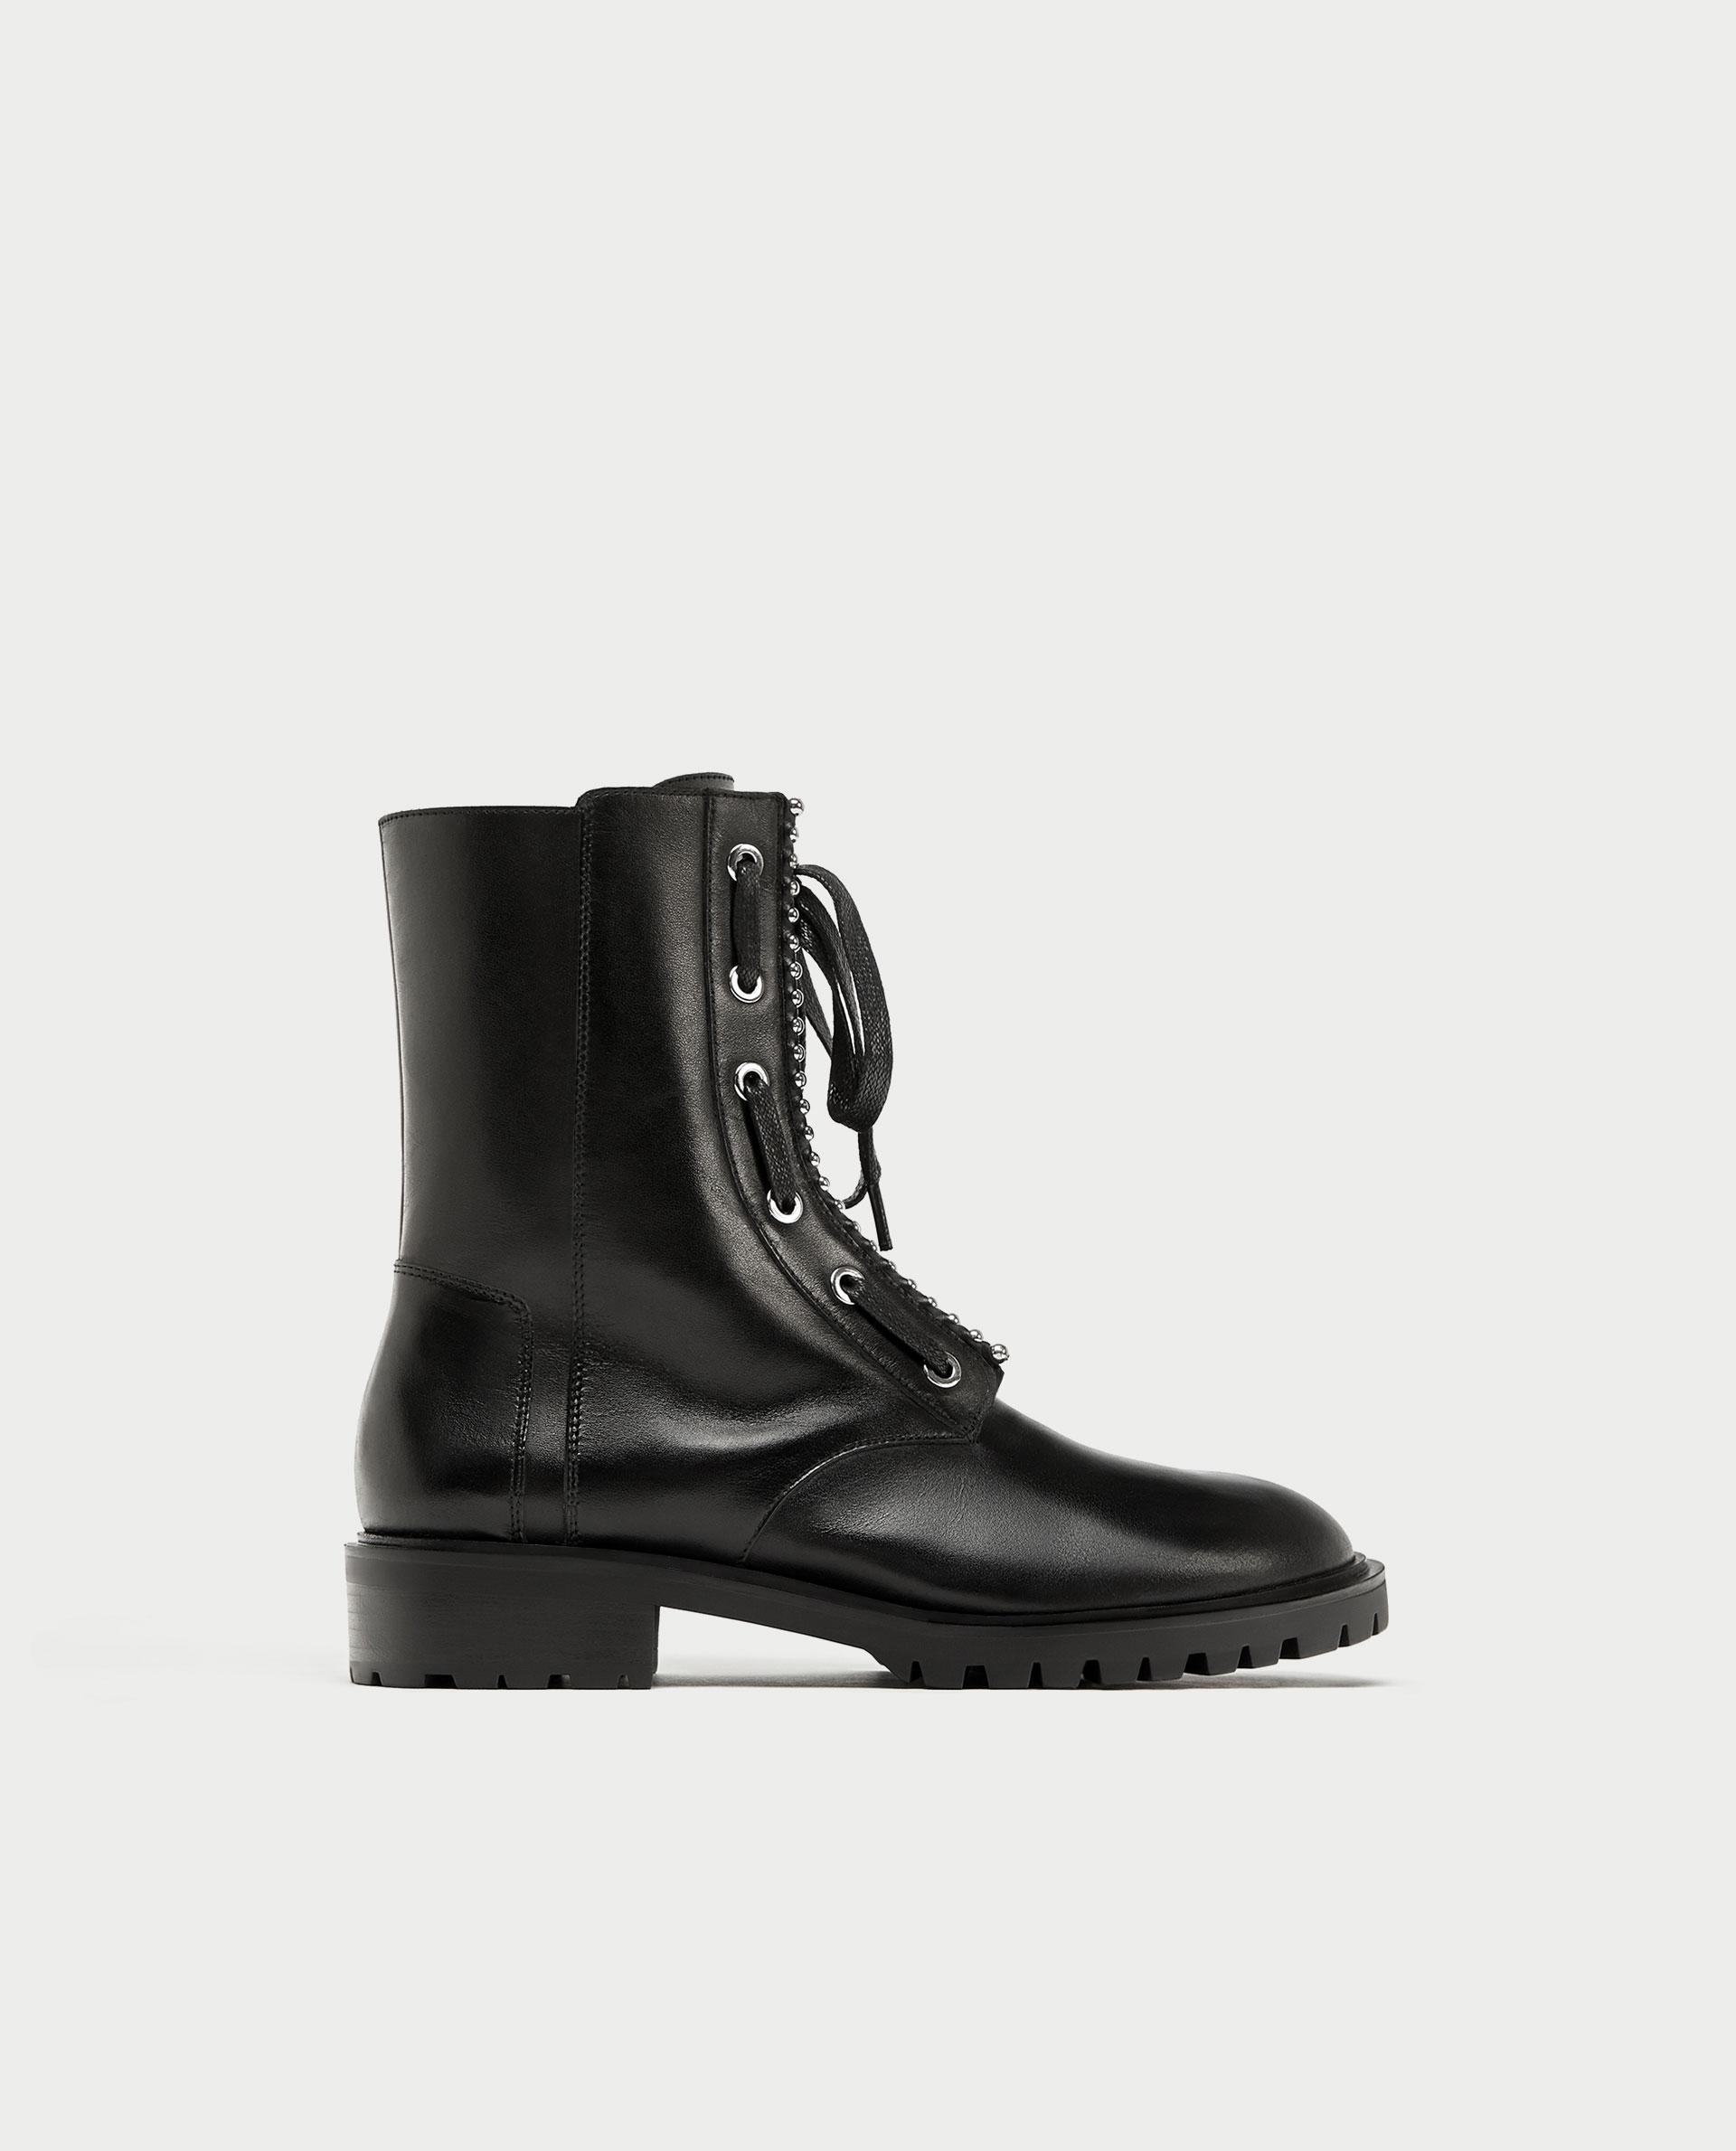 boots zara2